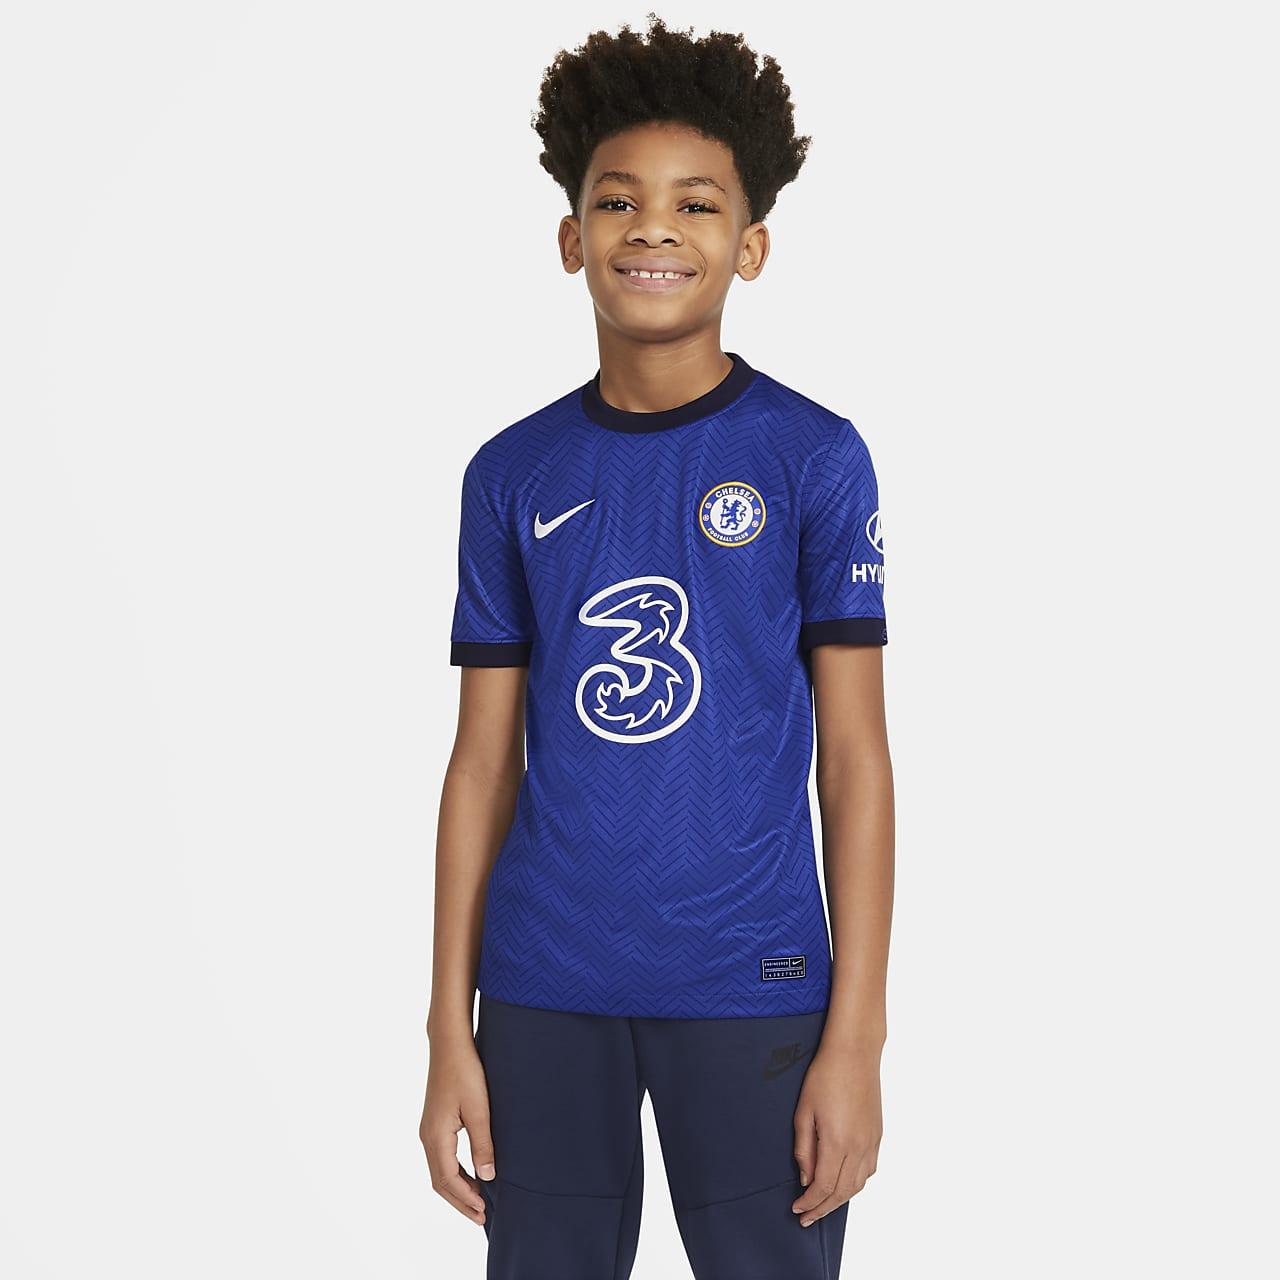 Chelsea FC 2020/21 Stadium Home Fußballtrikot für ältere Kinder